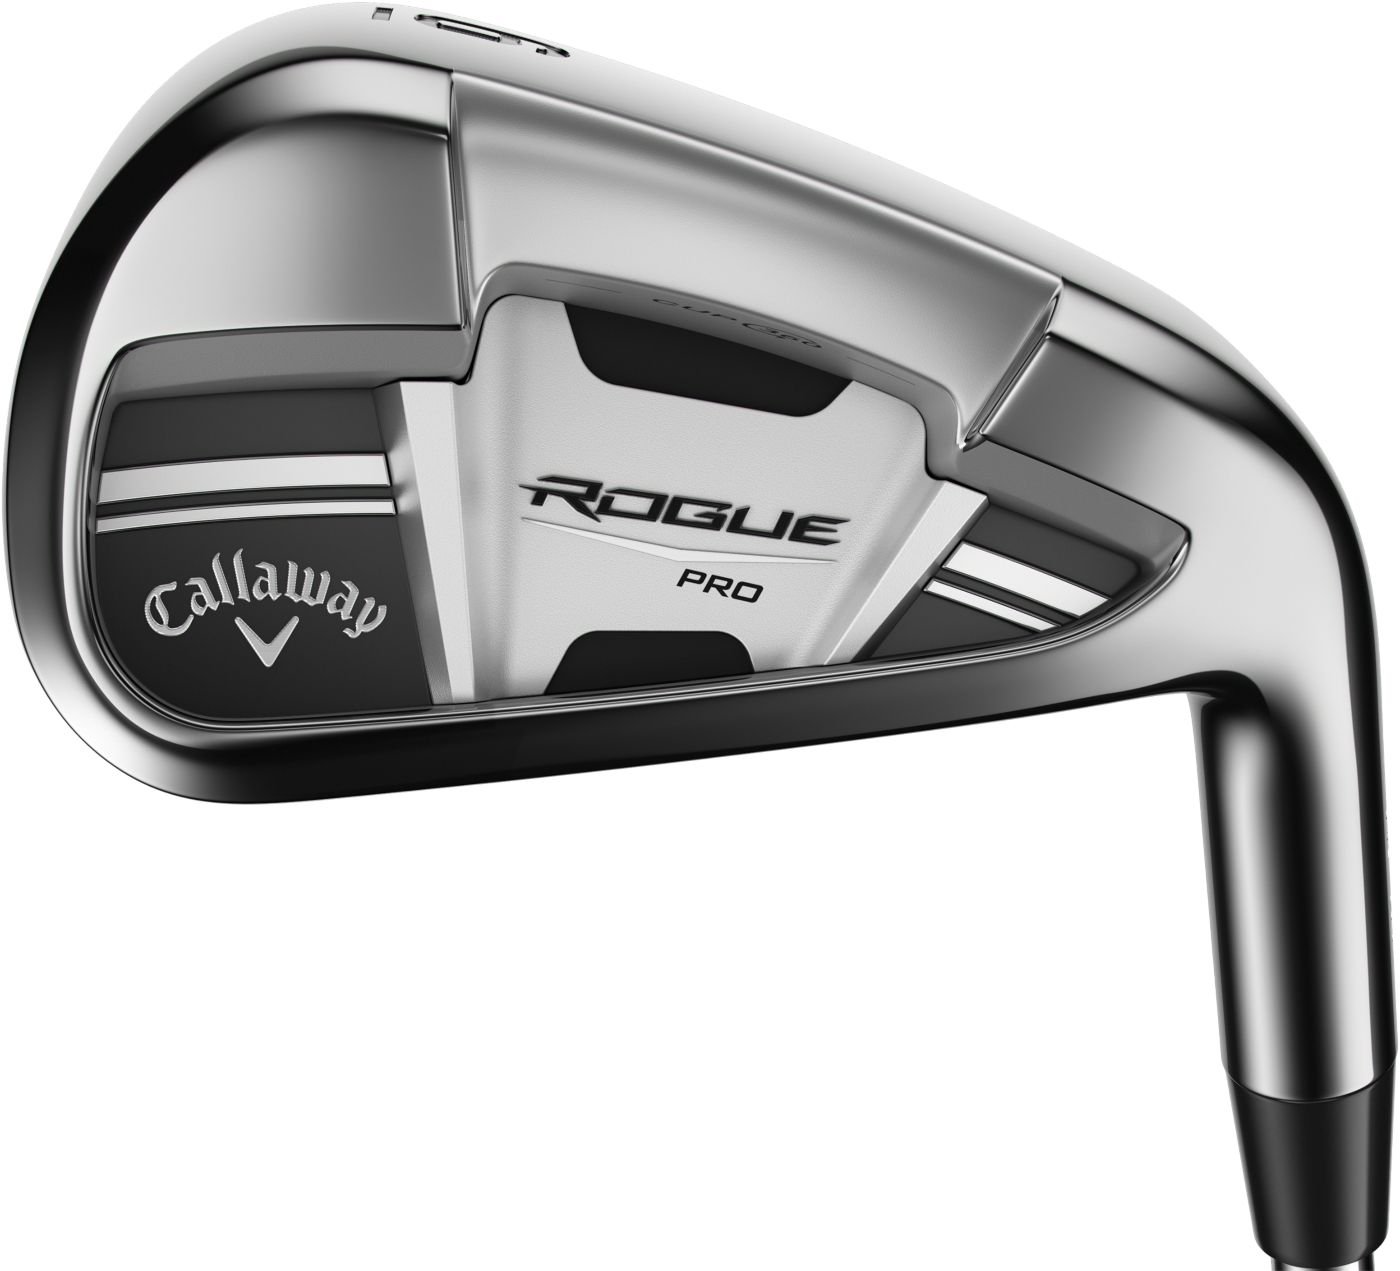 Callaway Rogue Pro Individual Irons – (Steel)